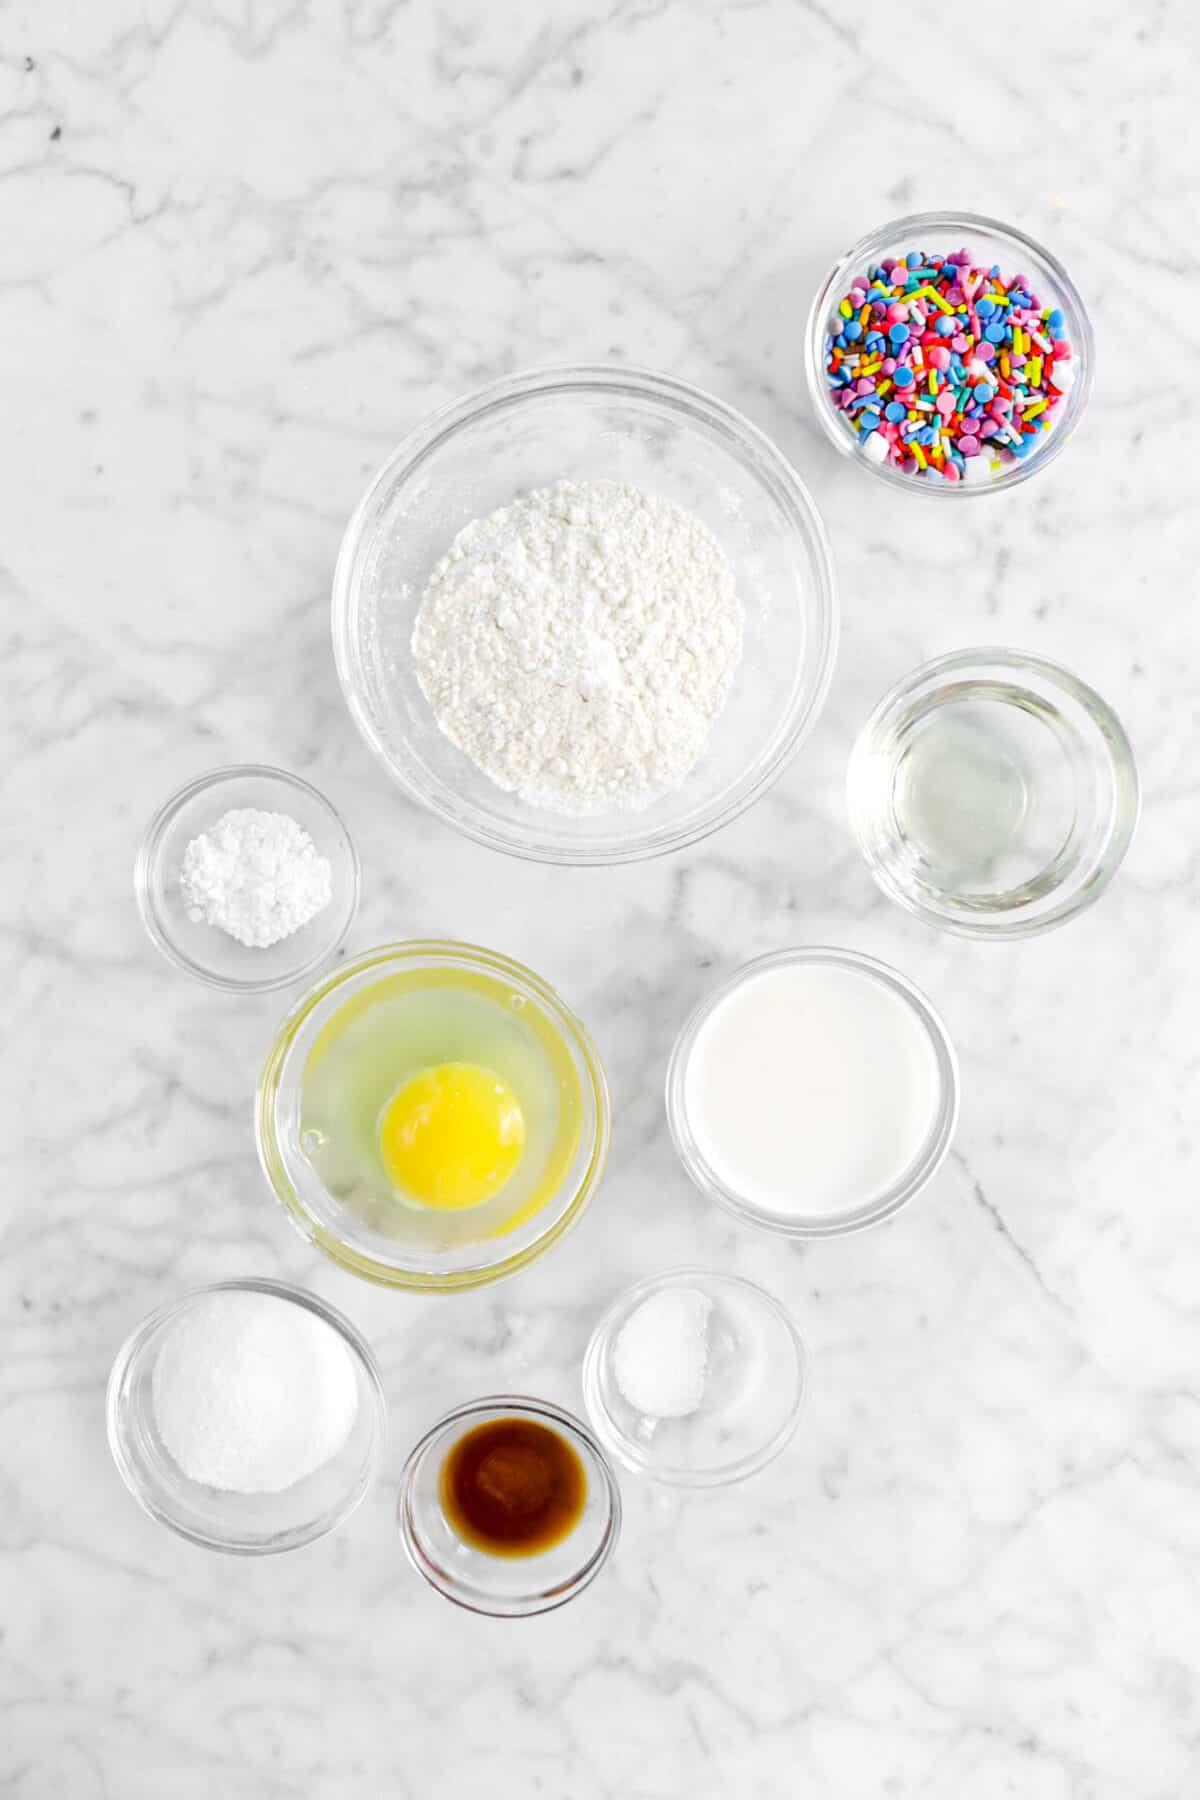 sprinkles, flour, vegetable oil, baking soda, milk, egg, salt, vanilla, and sugar